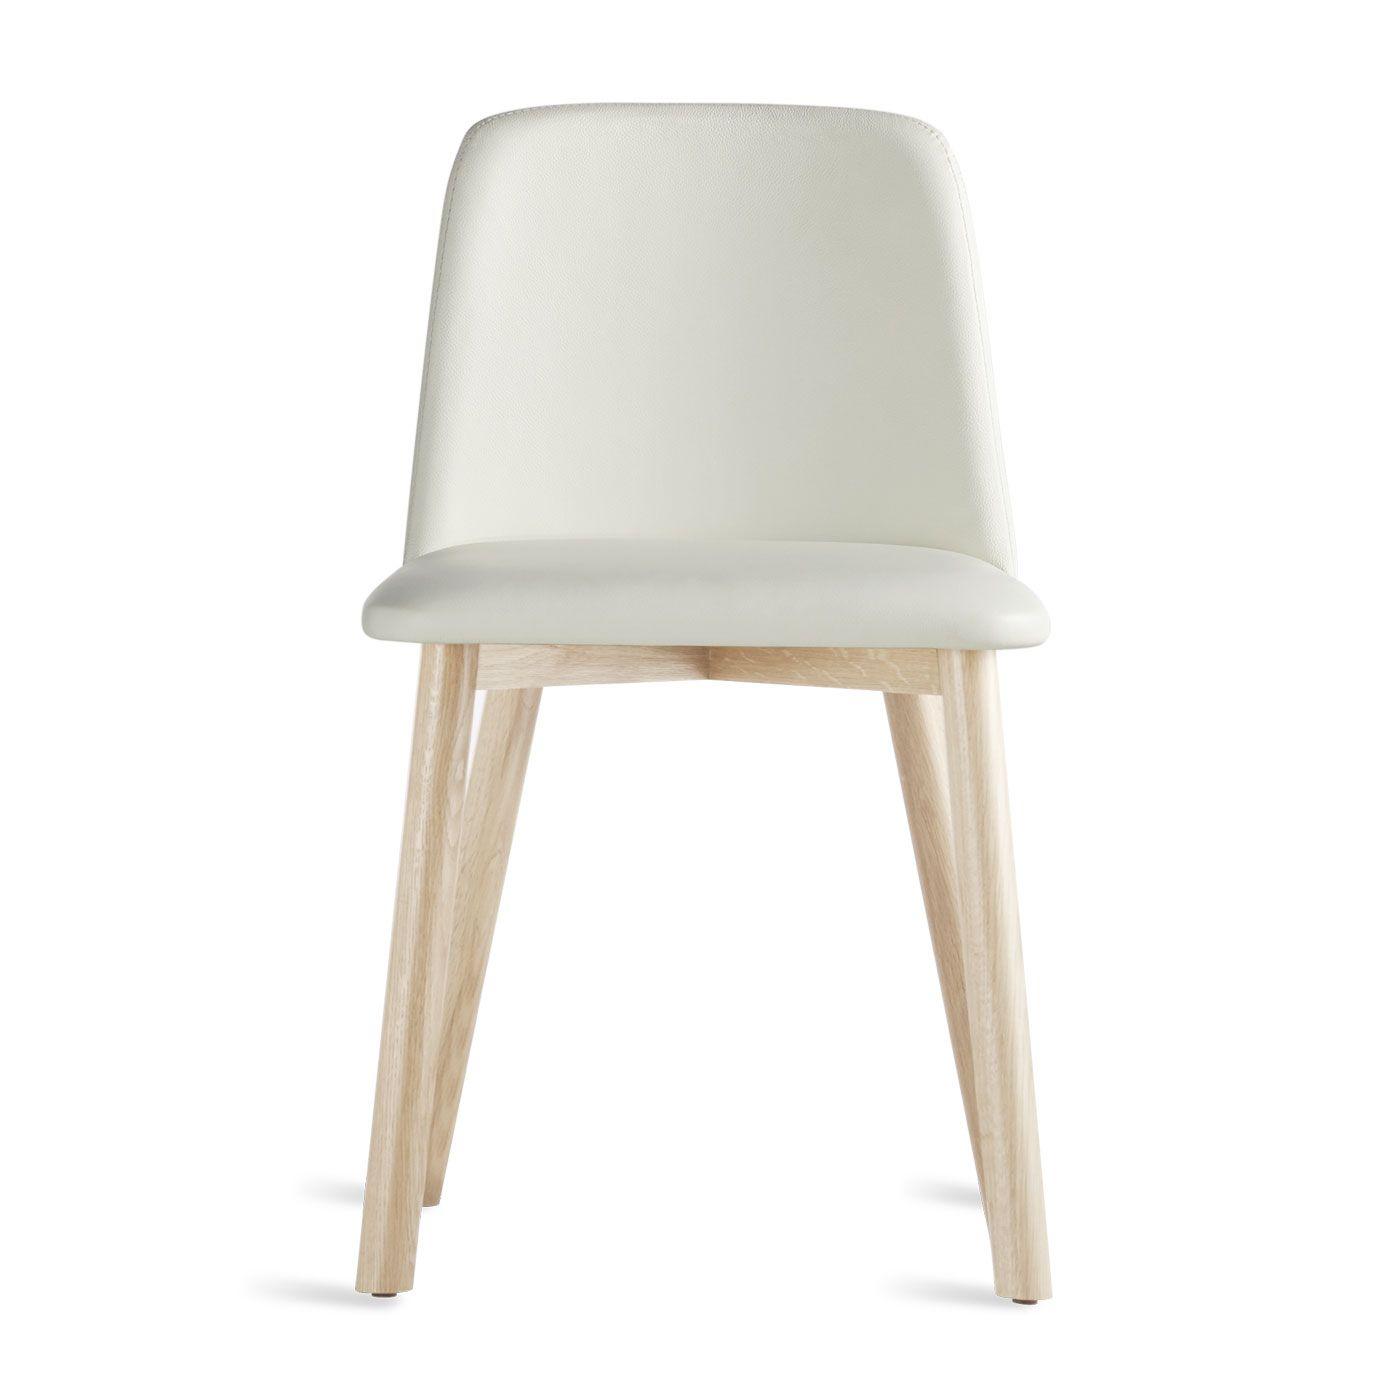 Phenomenal Chip Dining Chair Smoke Brown Leather Audrey Living Bralicious Painted Fabric Chair Ideas Braliciousco